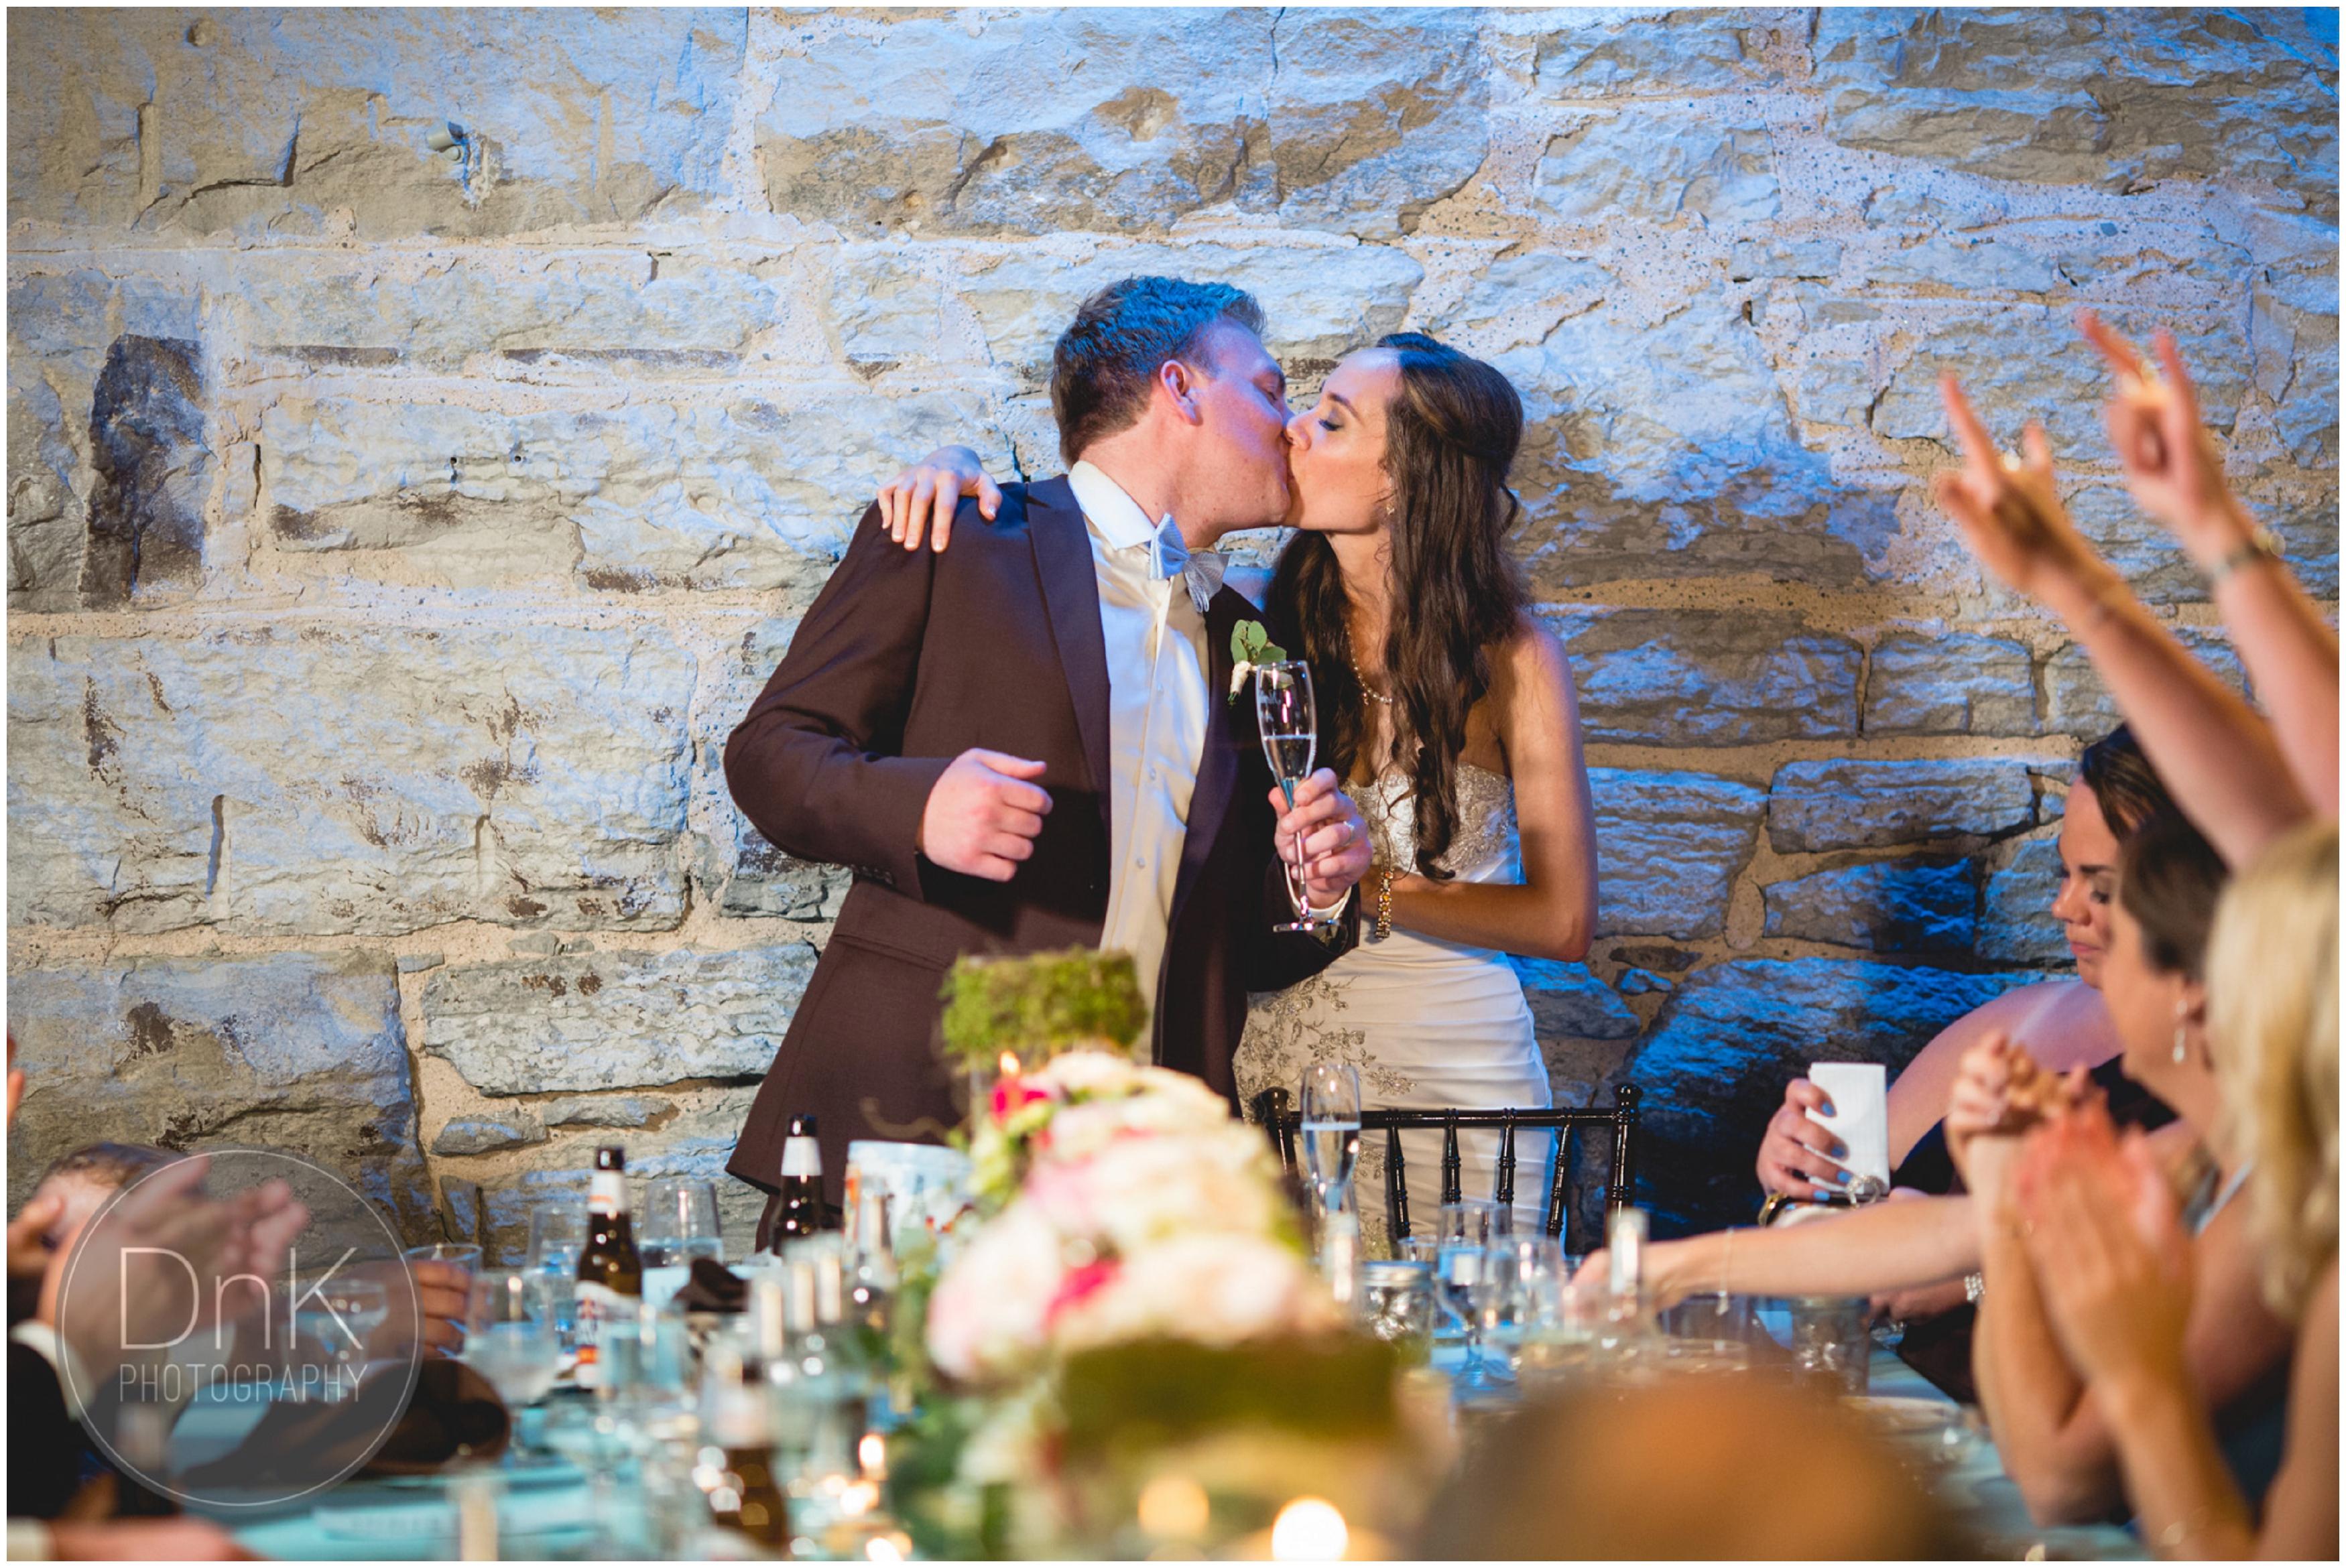 27 - 413 on Wacouta Wedding Reception